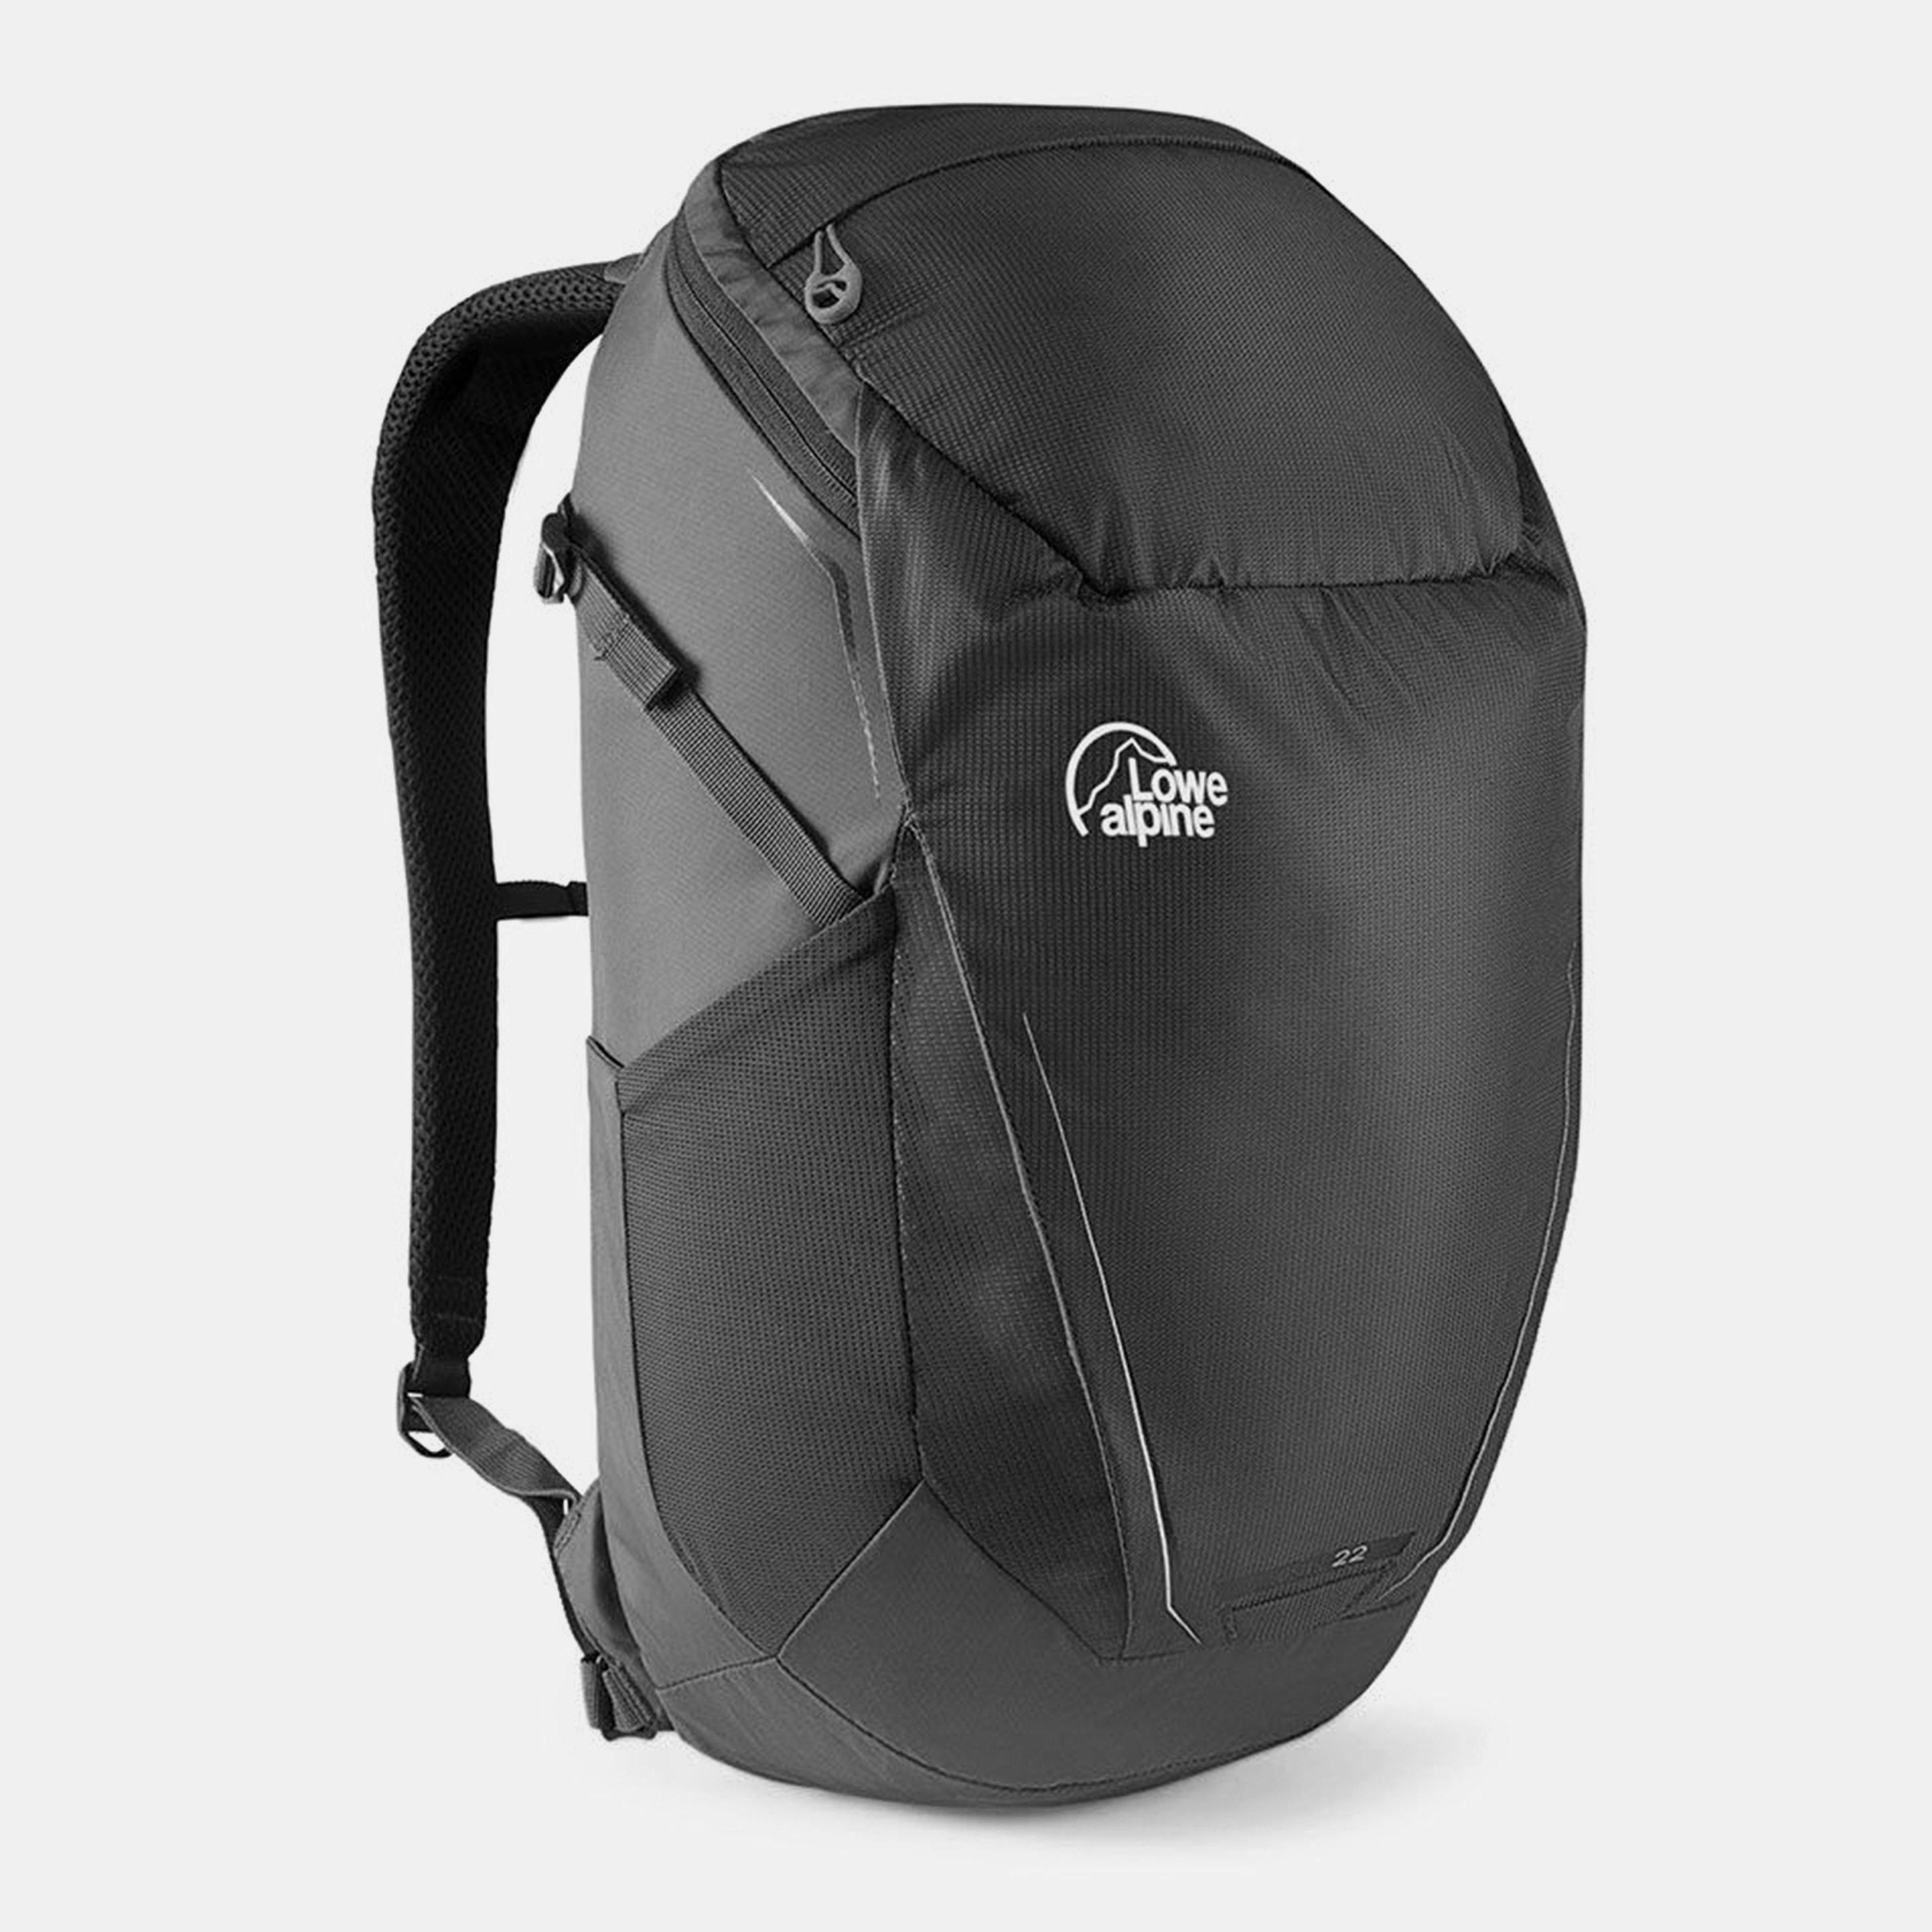 Lowe Alpine Lowe Alpine Link 22L Backpack - Black, Black